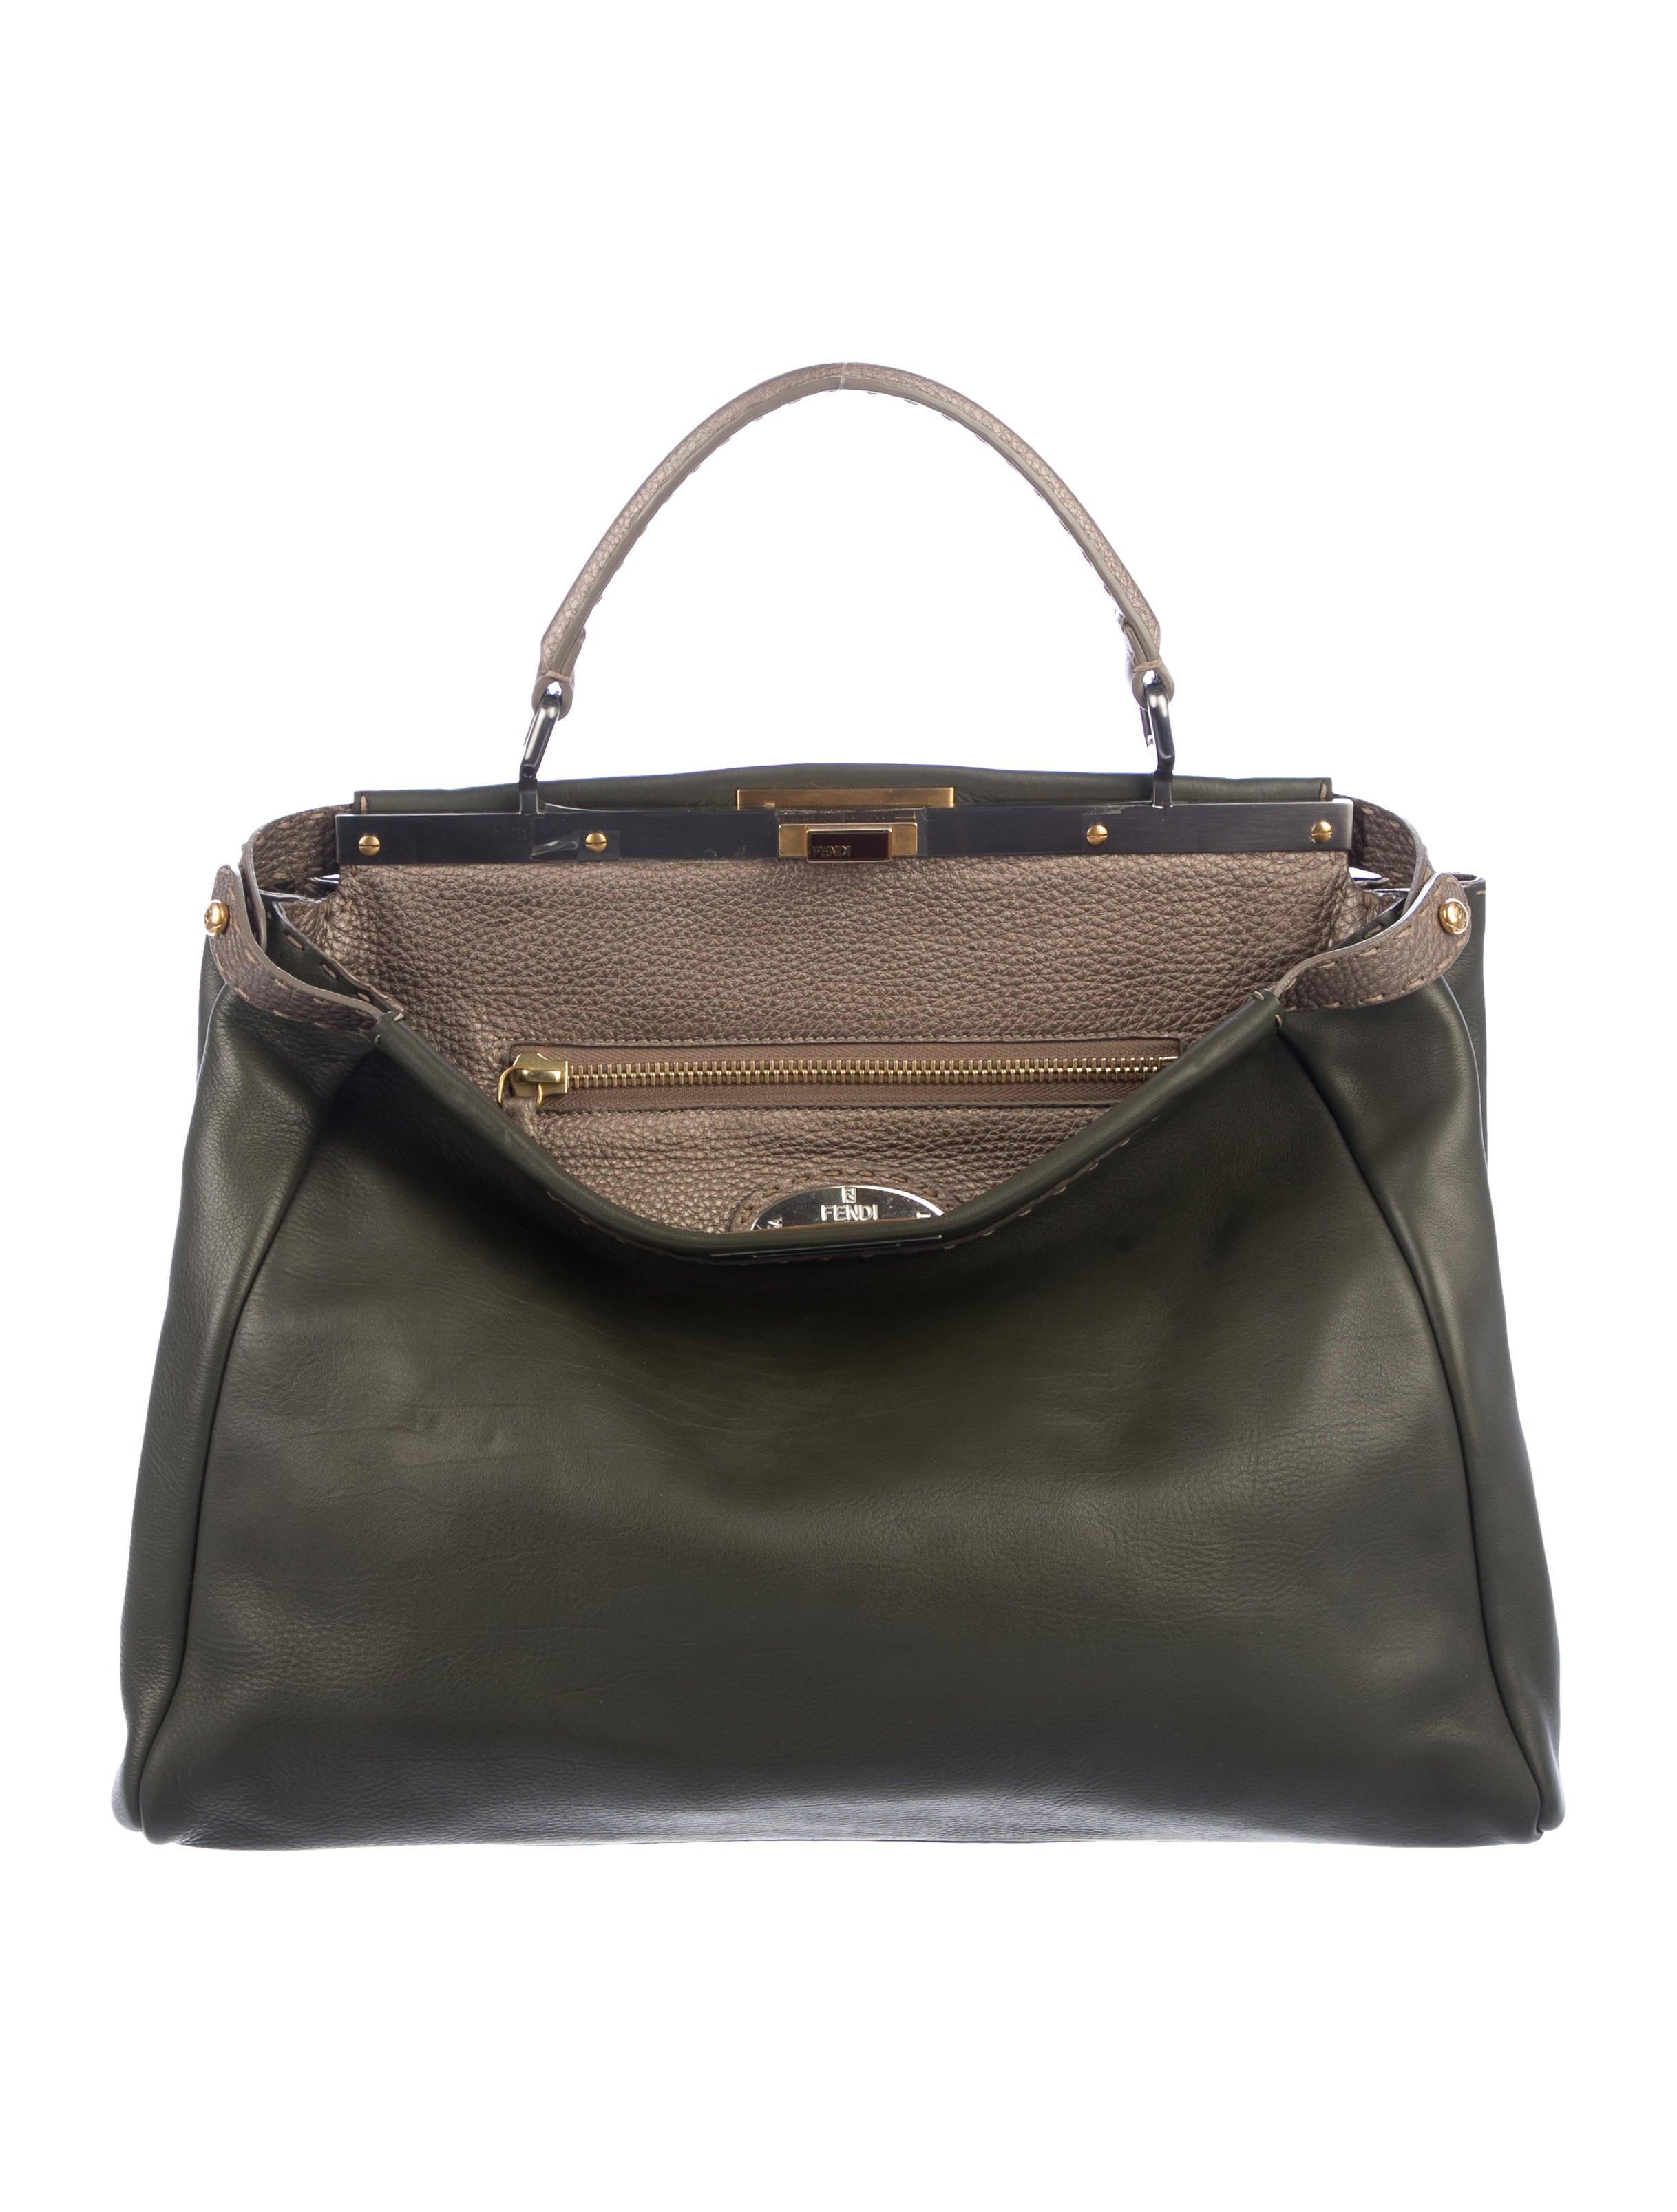 13da73d87d Fendi Selleria Large Peekaboo Bag - Handbags - FEN90596